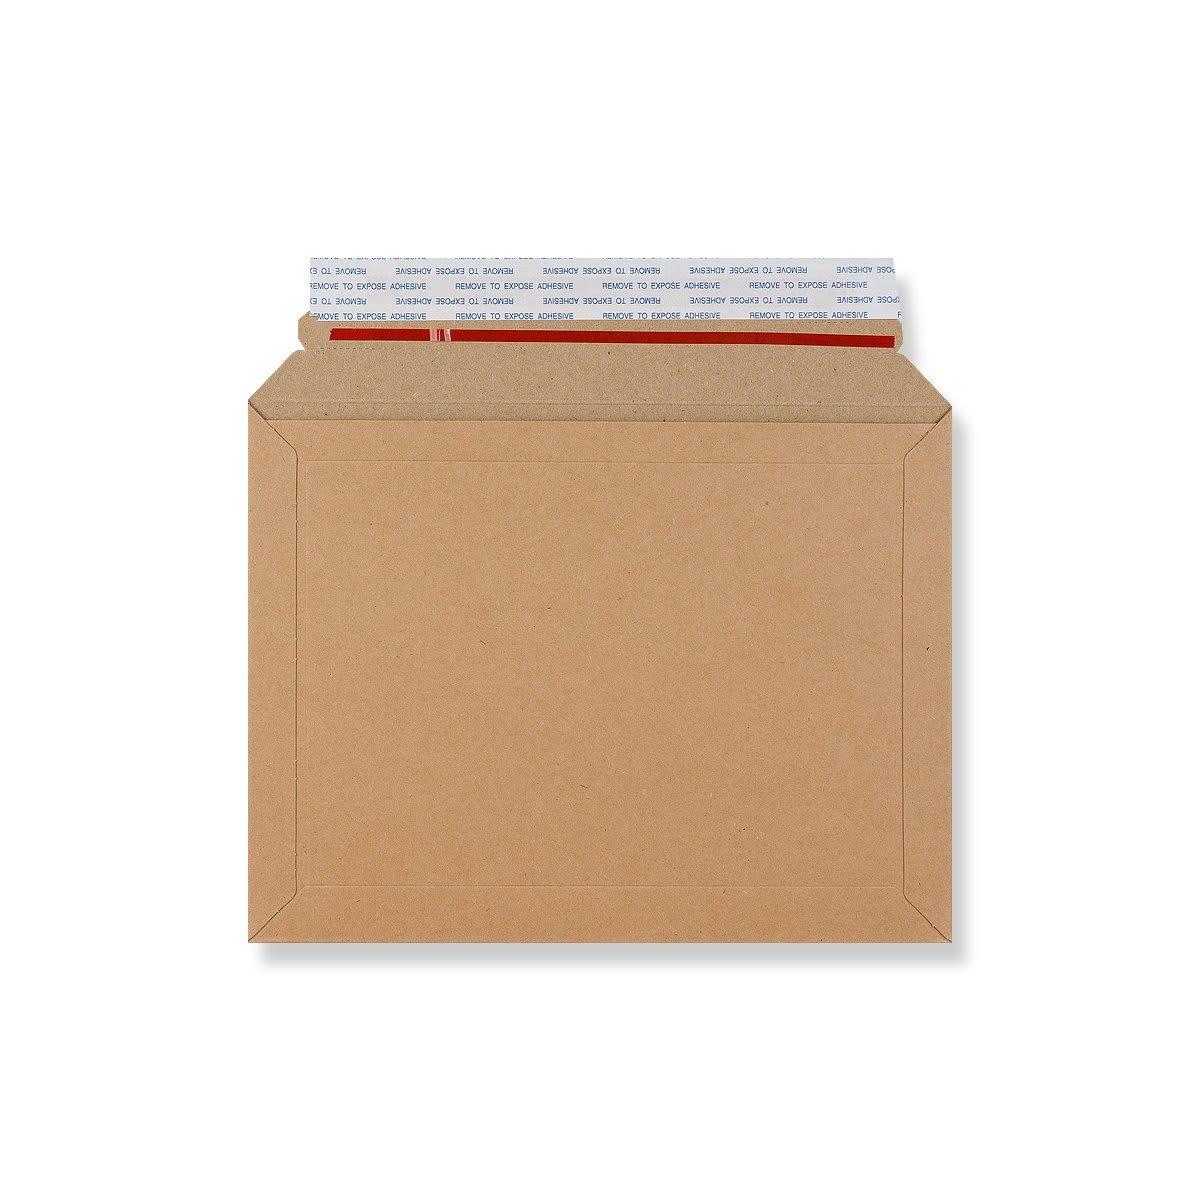 MANILLA CAPACITY BOOK MAILER 321 X 467 MM (400 gsm)